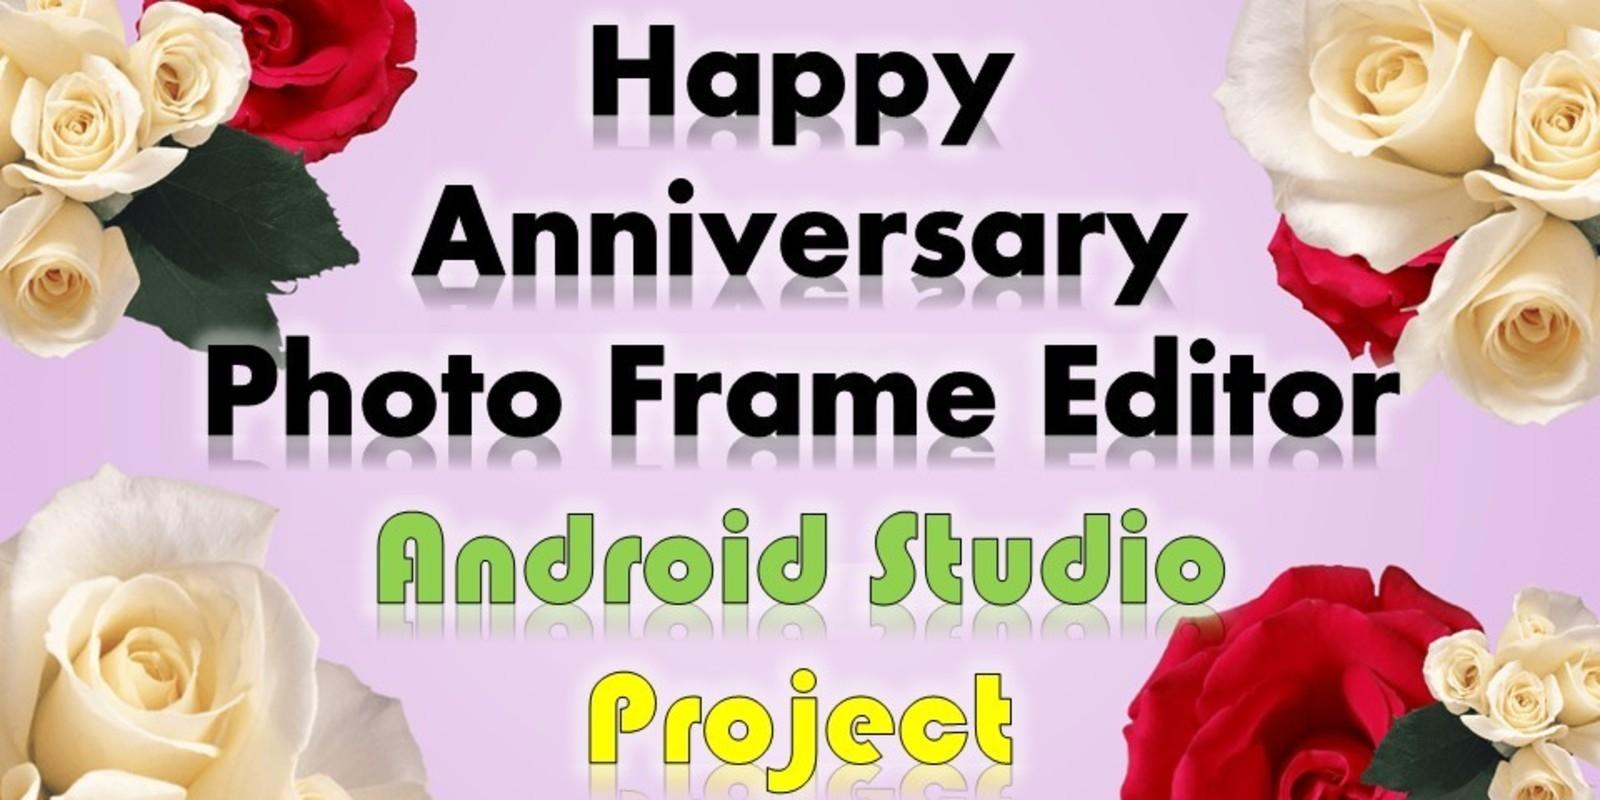 Anniversary Photo Frames Editor Android Studio